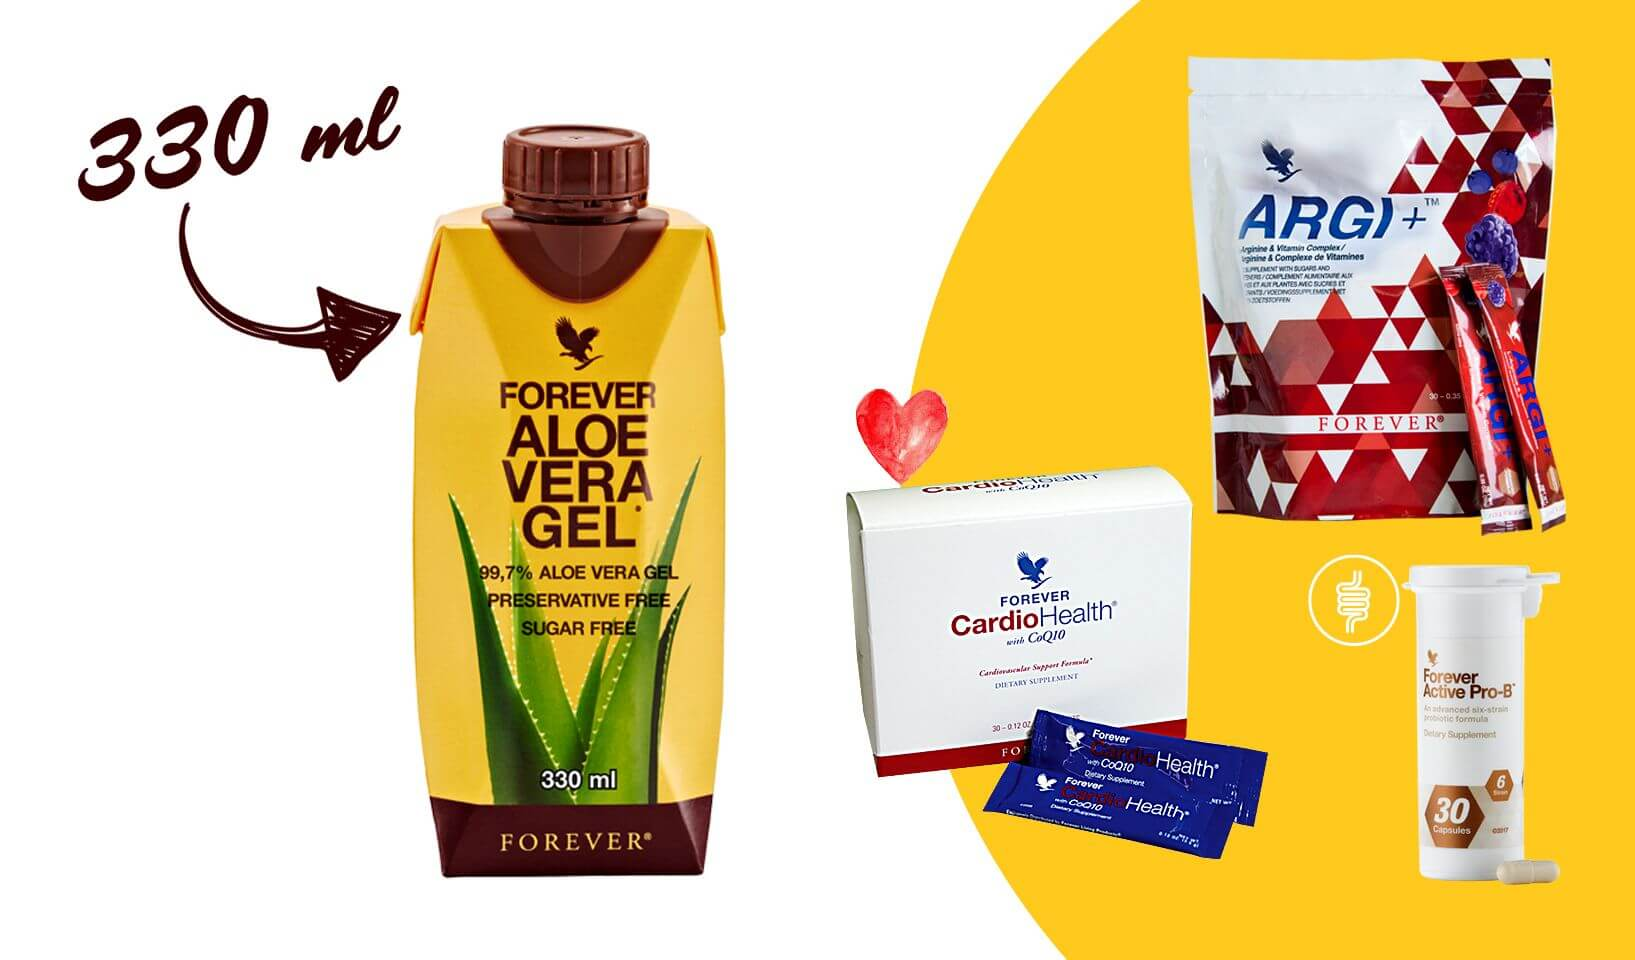 Forever CardioHealth, Argi +, Forever Active ProB, Aloe Vera Gel